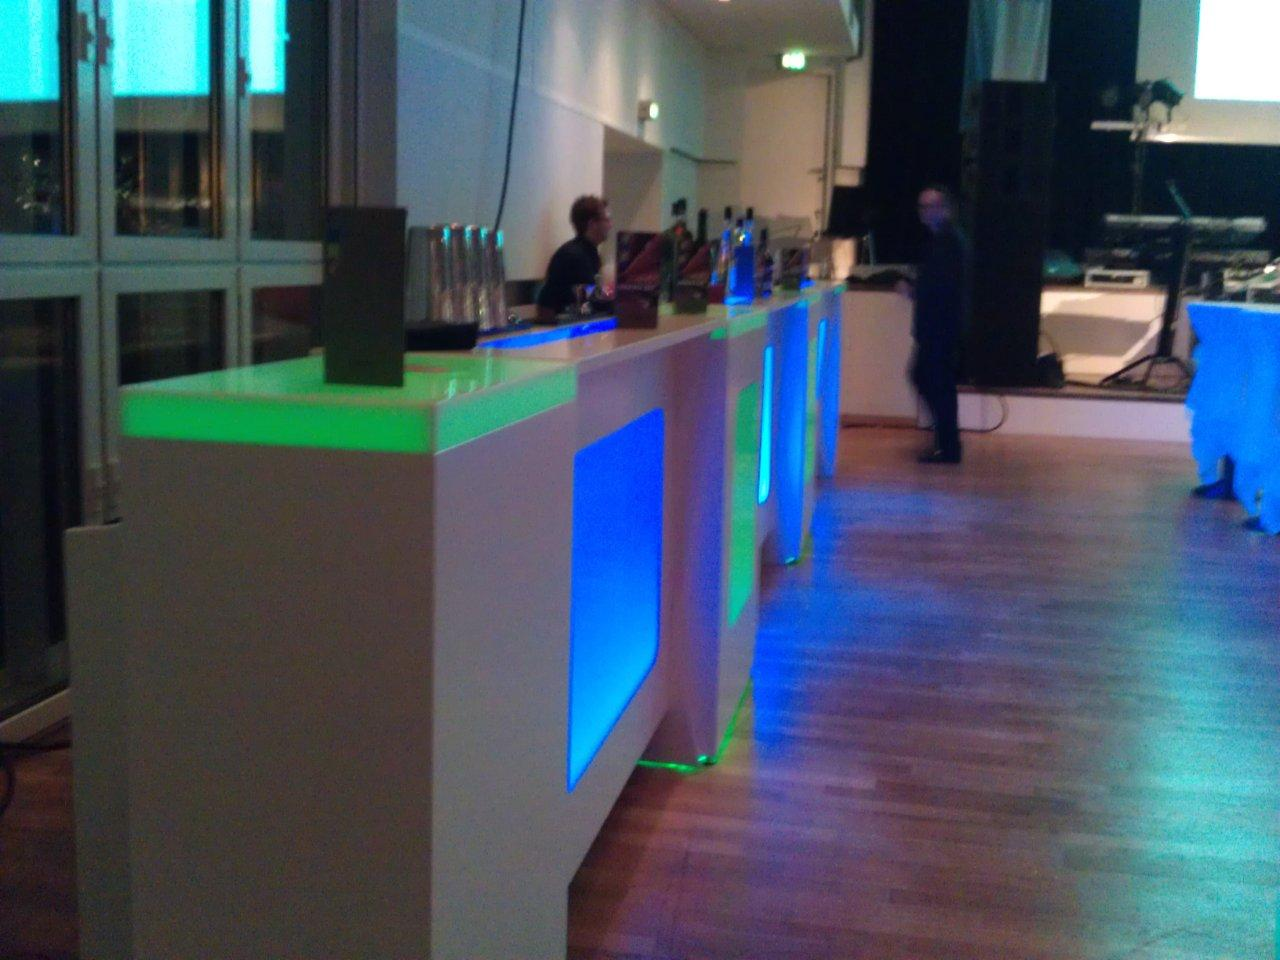 Bar_Elegance+Classic+Beistellmodule (1)